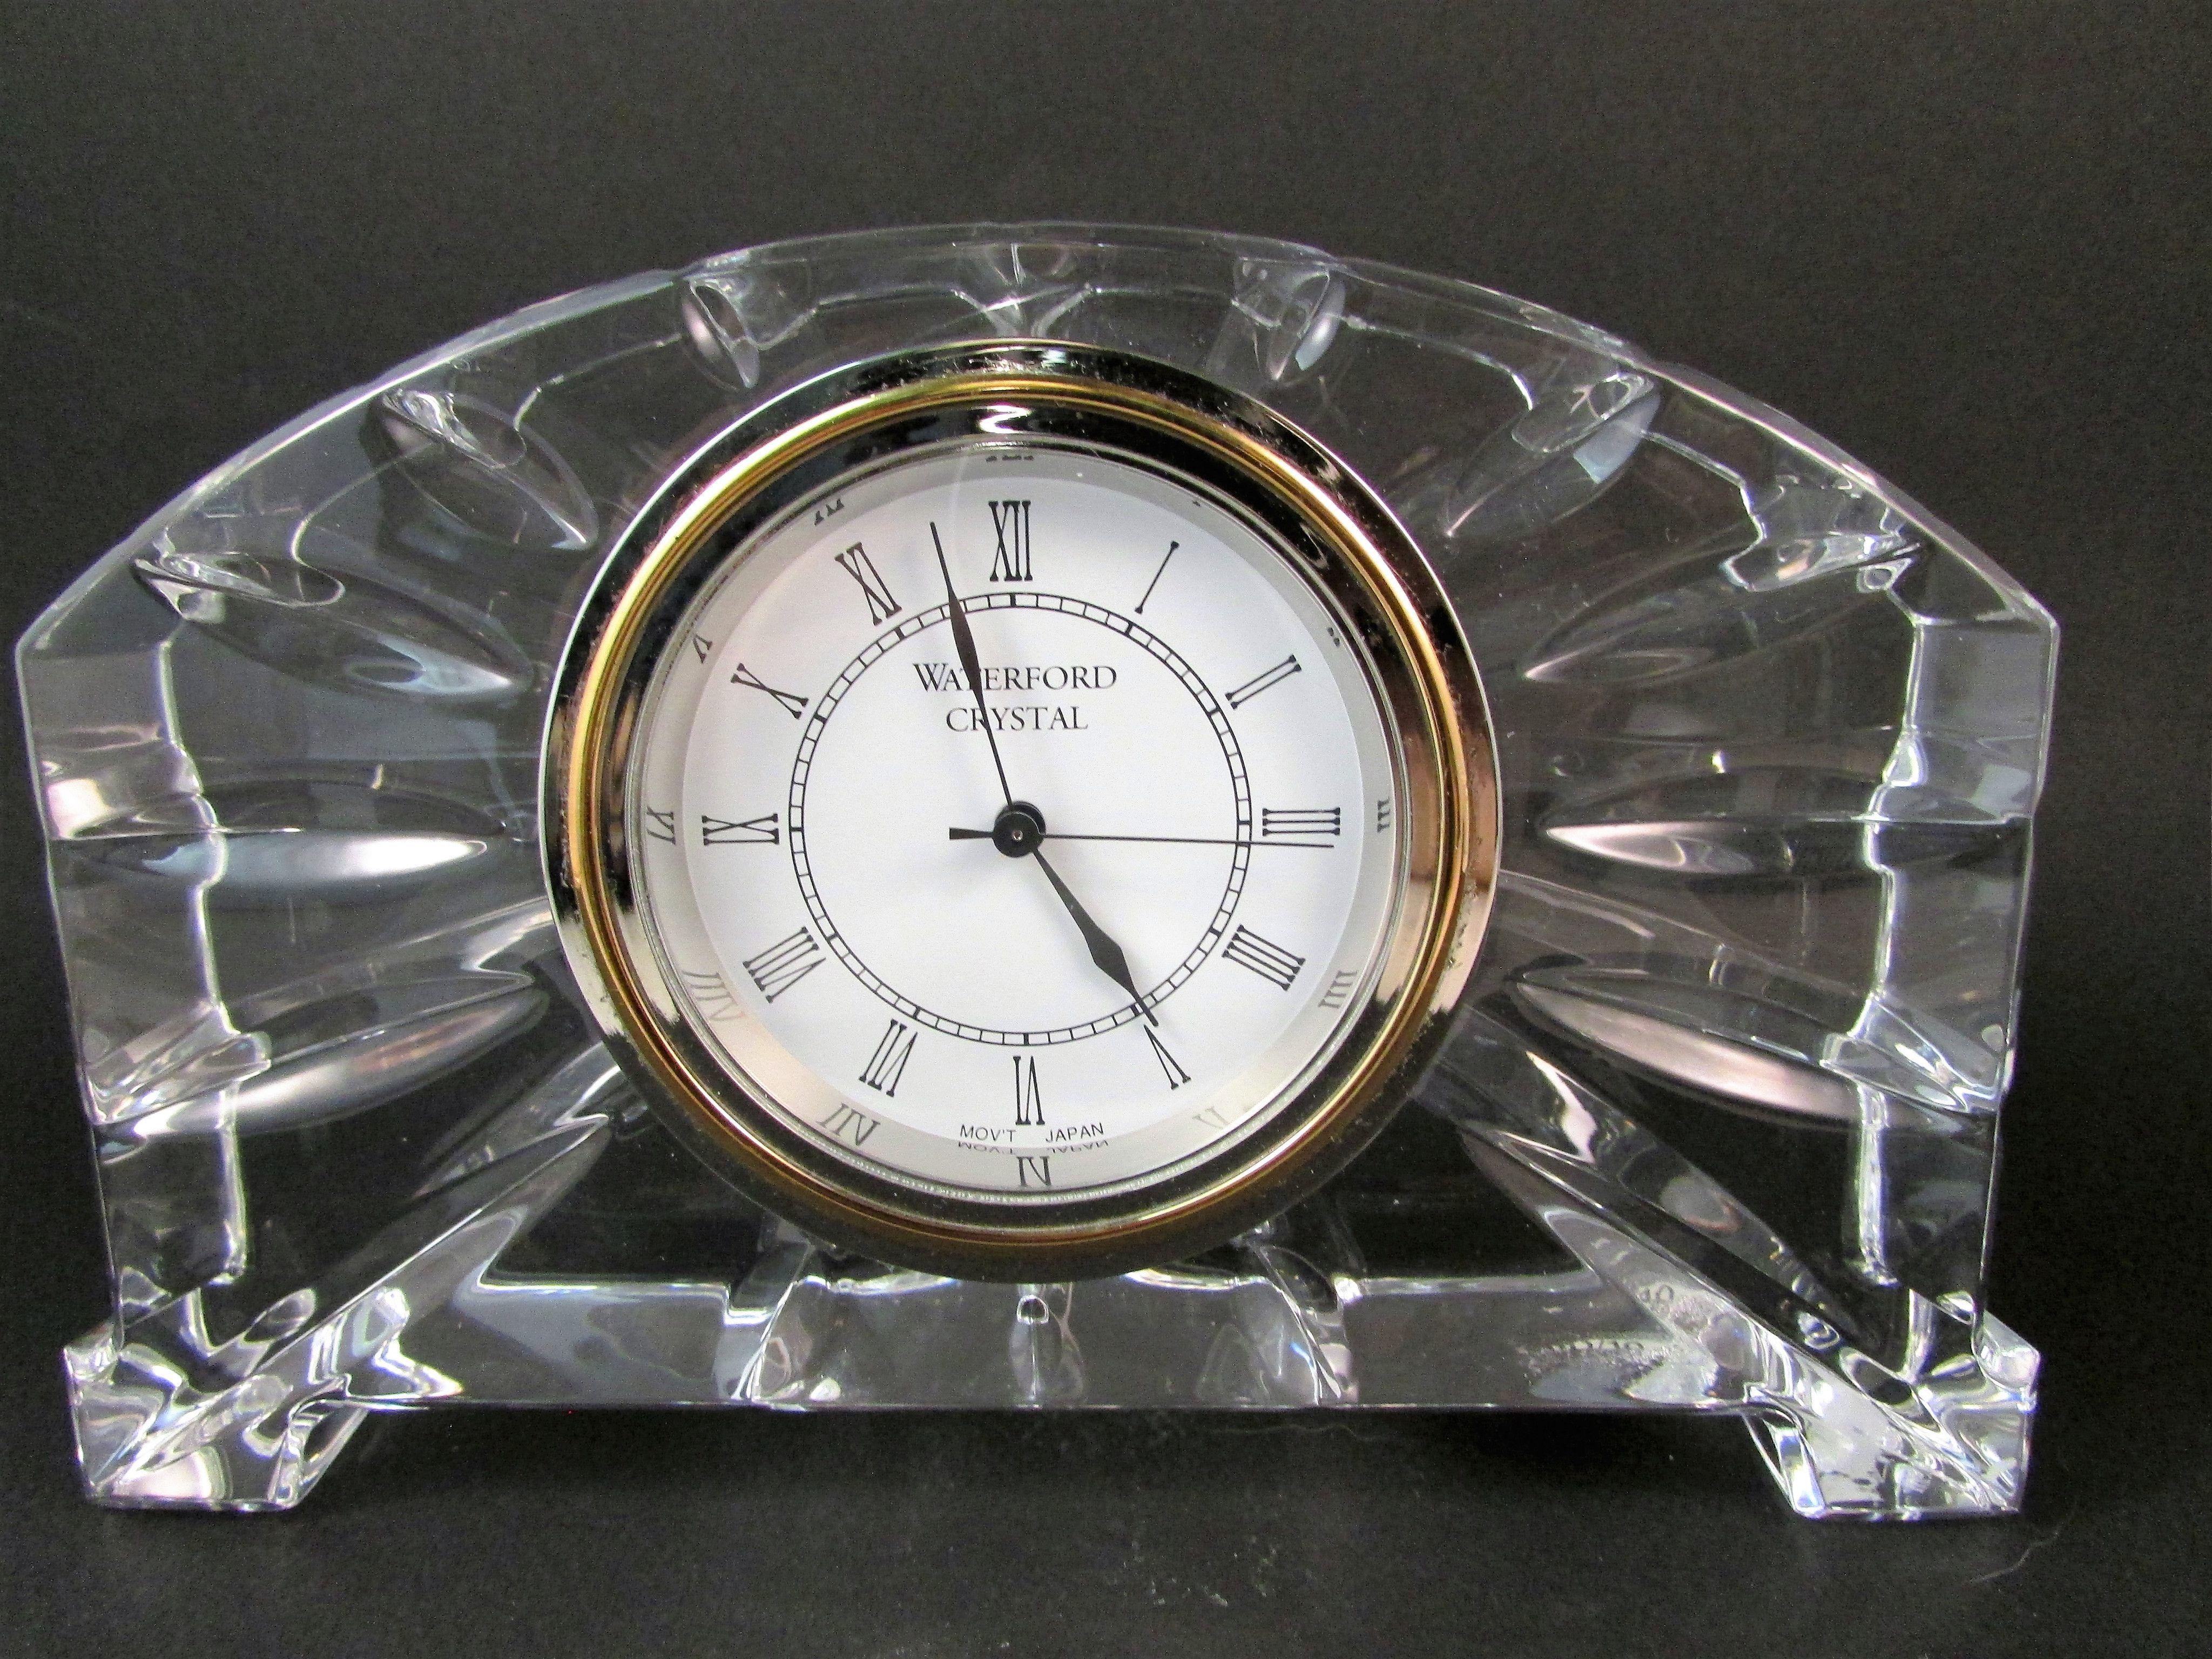 Waterford ireland crystal mantel clock waterford ireland mantel waterford ireland crystal mantel clock amipublicfo Choice Image